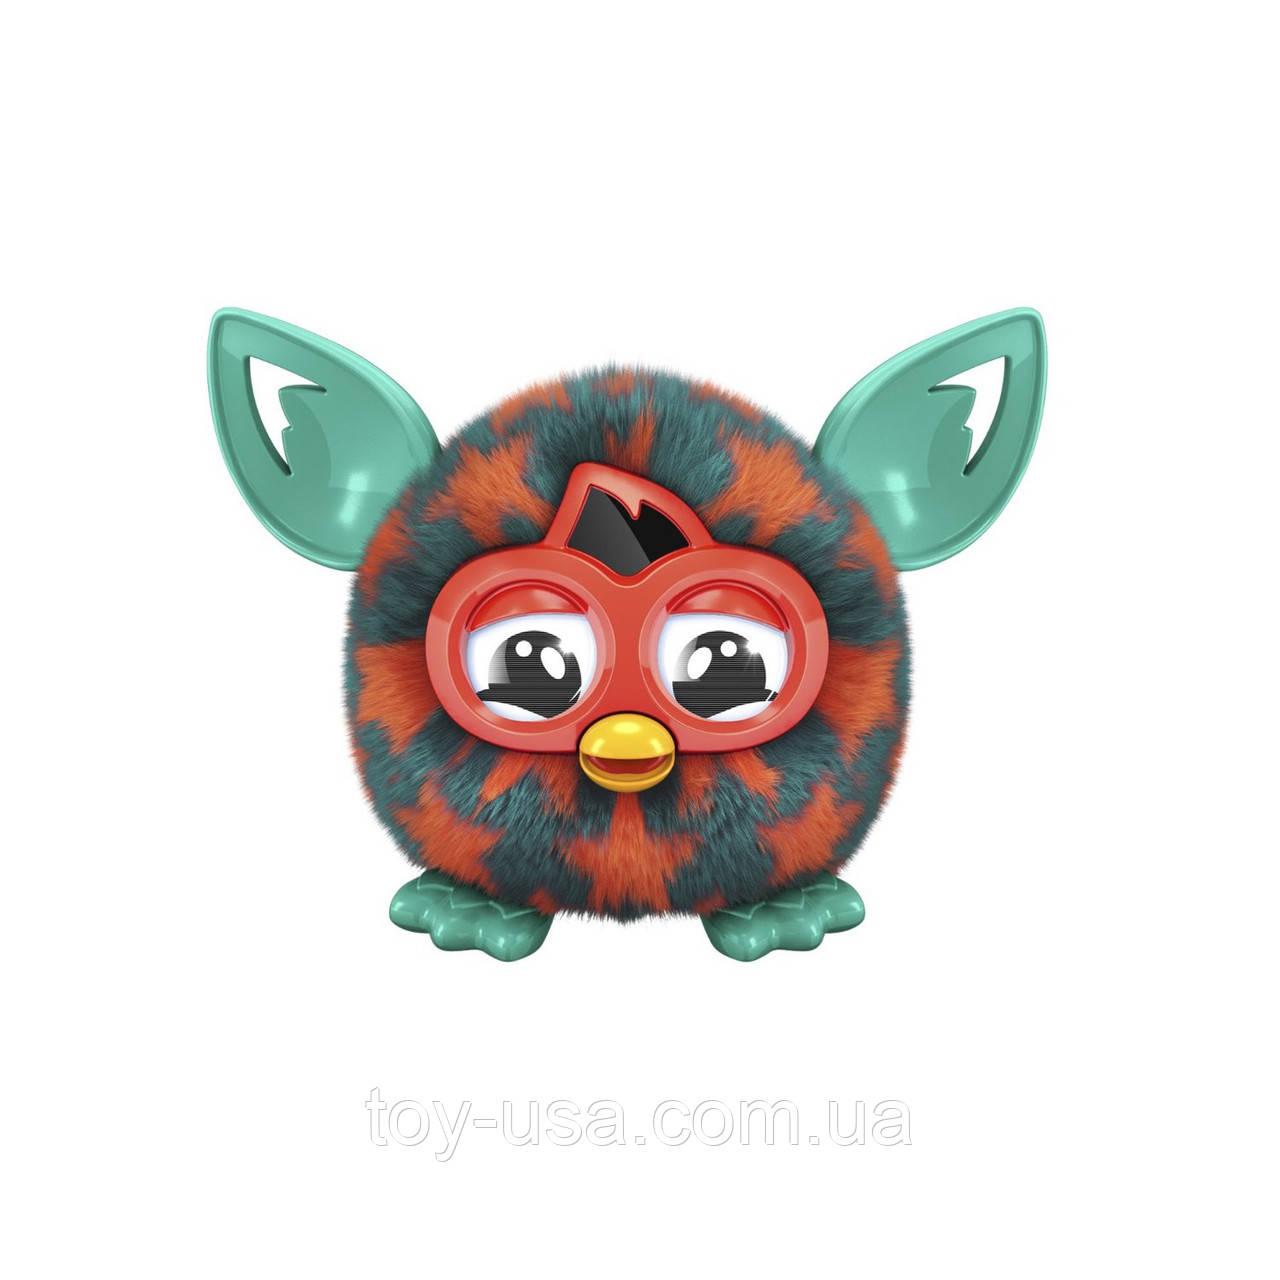 Furby Boom Orange Stars Plush Toy